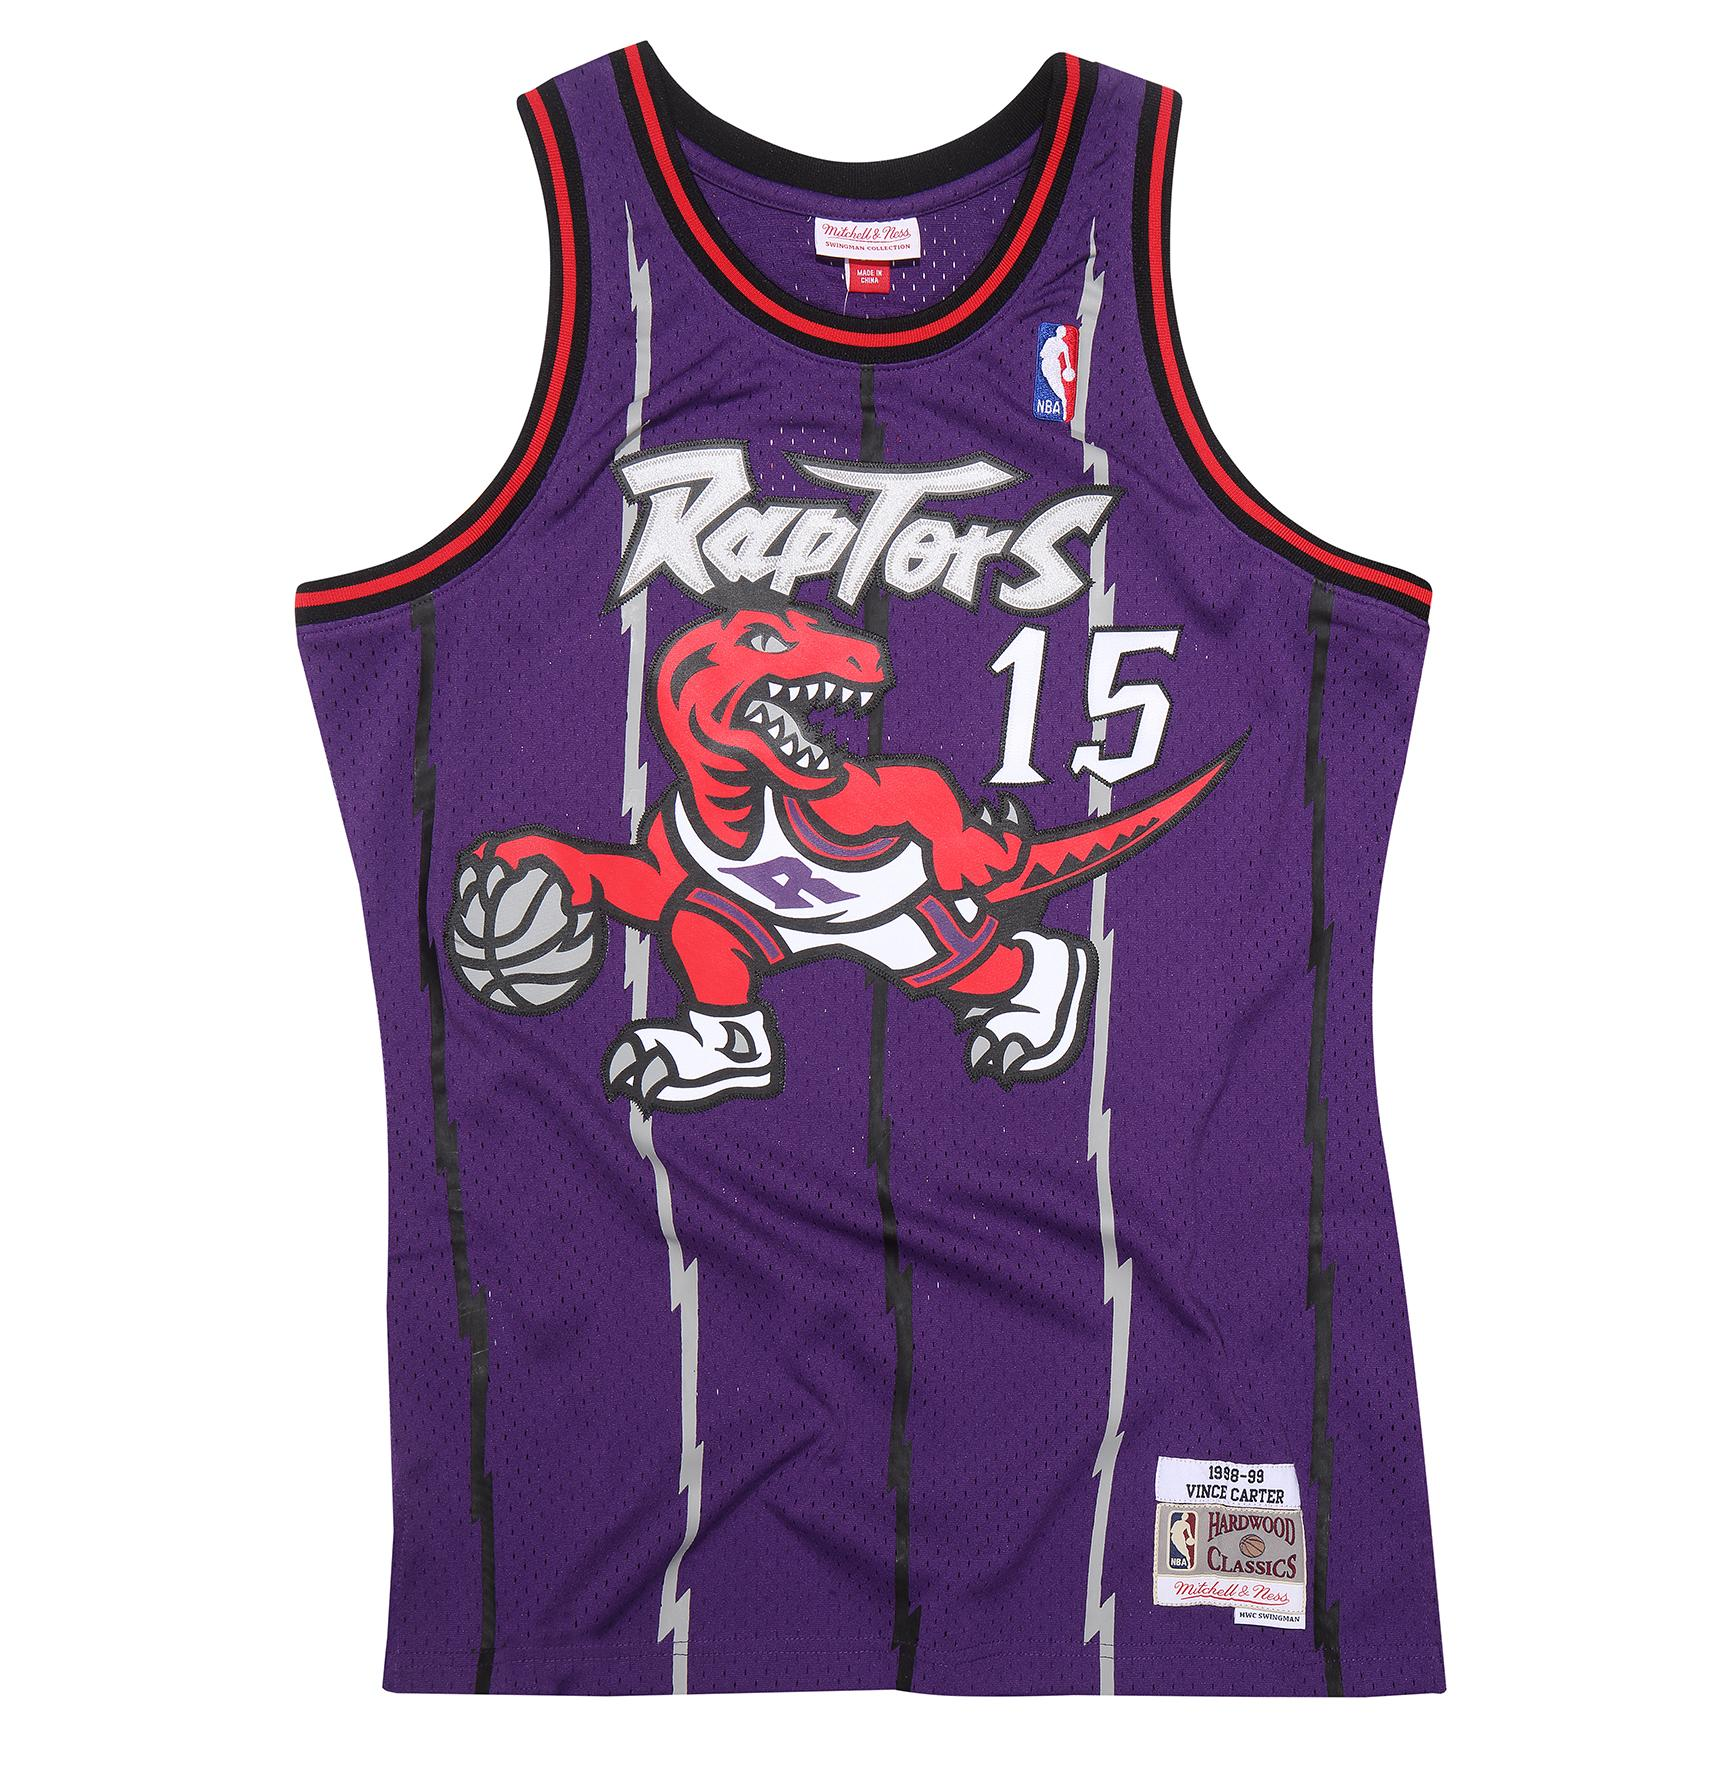 best service c00e4 5afab Mitchell & Ness | Vince Carter 1998-99 Toronto Raptors ...